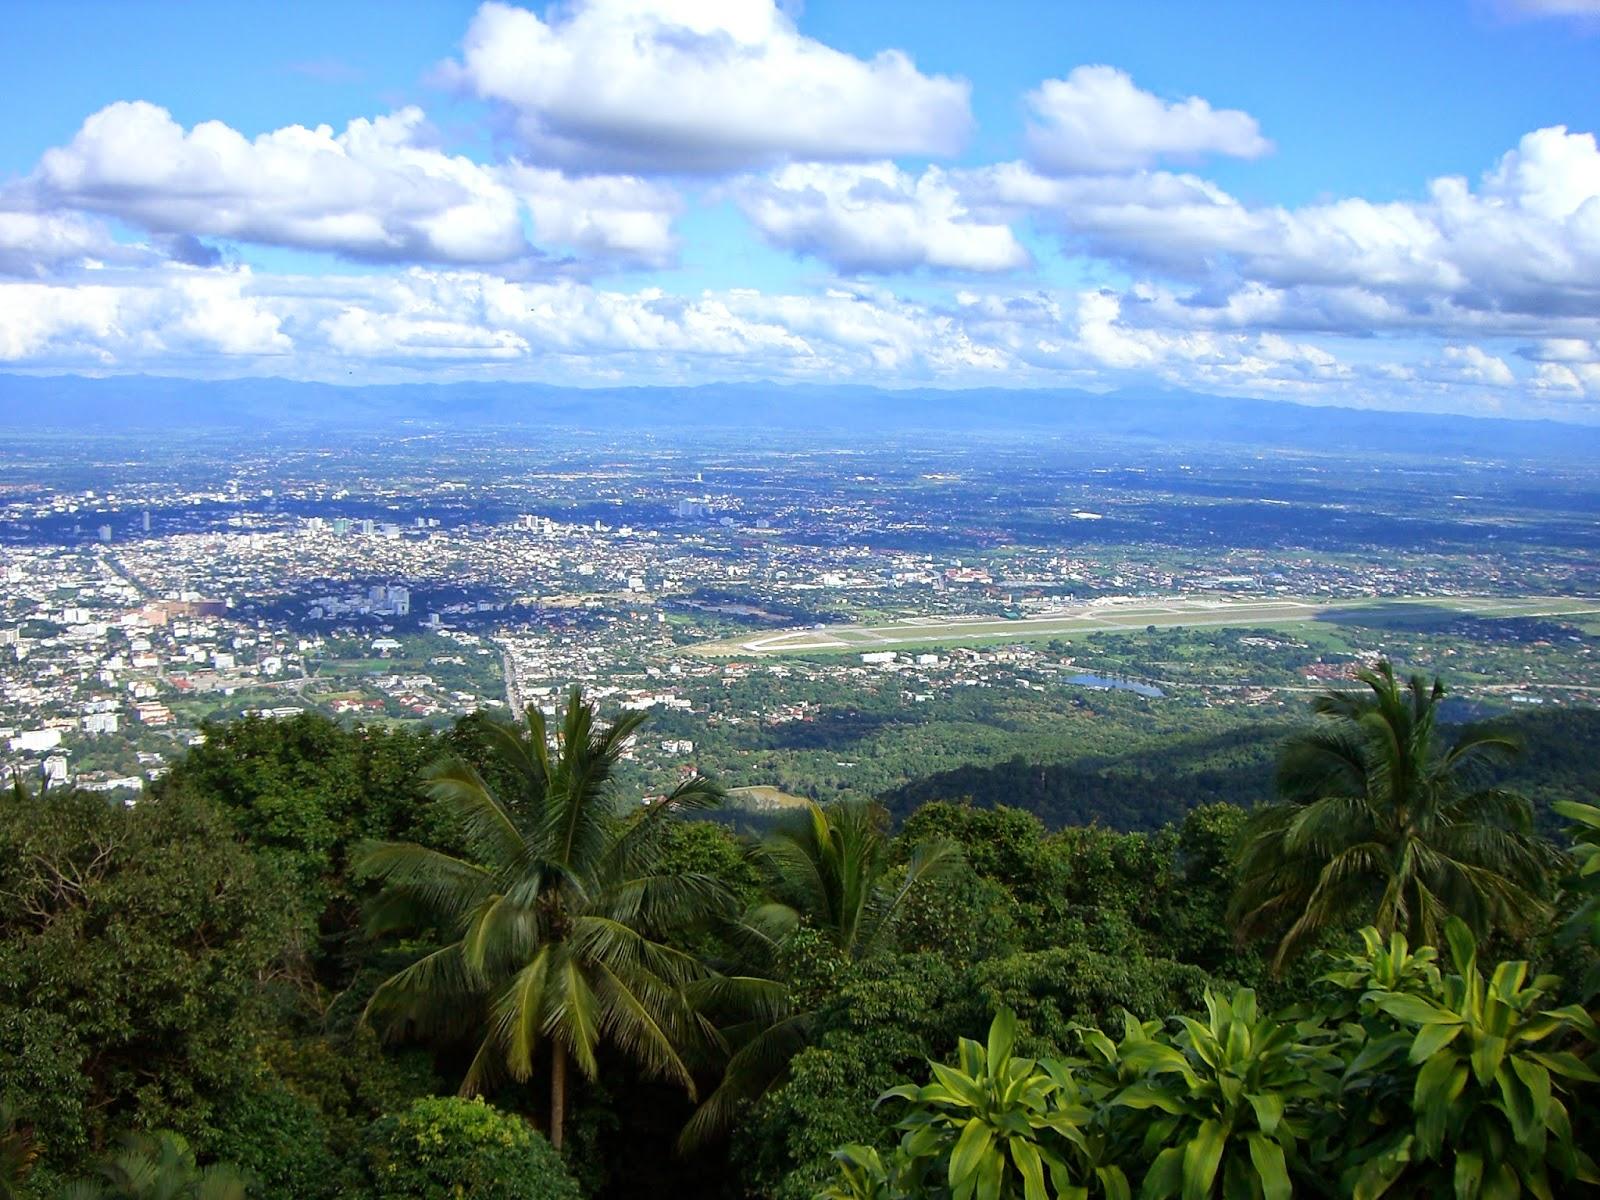 Chiang Mai, Thailand - Tourist Destinations